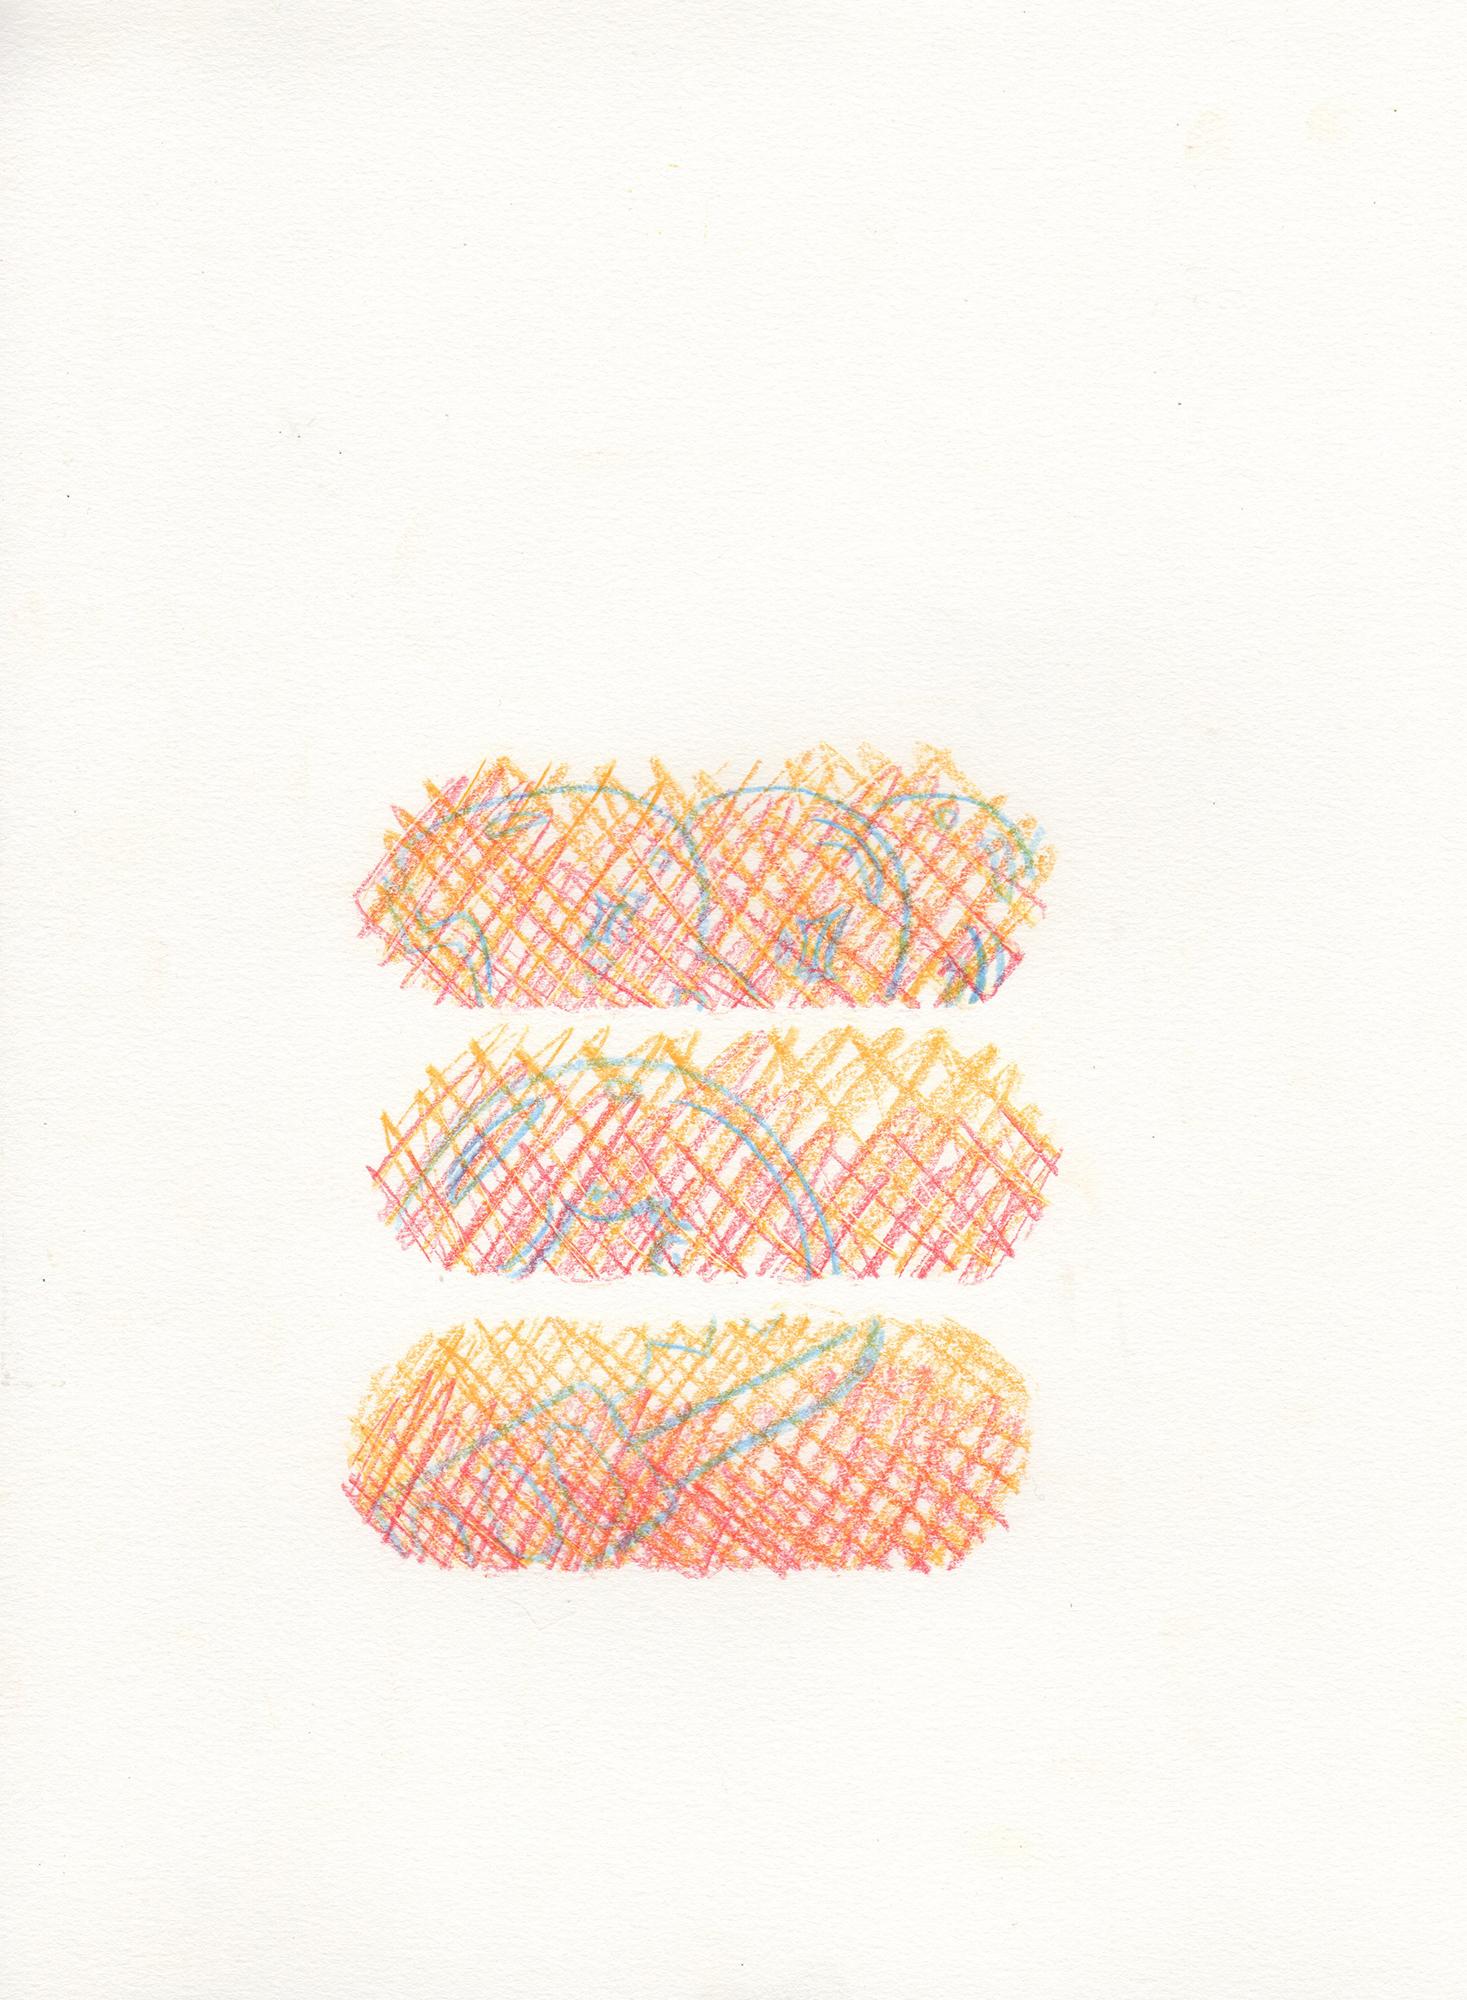 Shaped canvas, Australian artist, contemporary art, Australian artist, Perth artist, painting, futuristic, gradient, exhibition, disabled artist